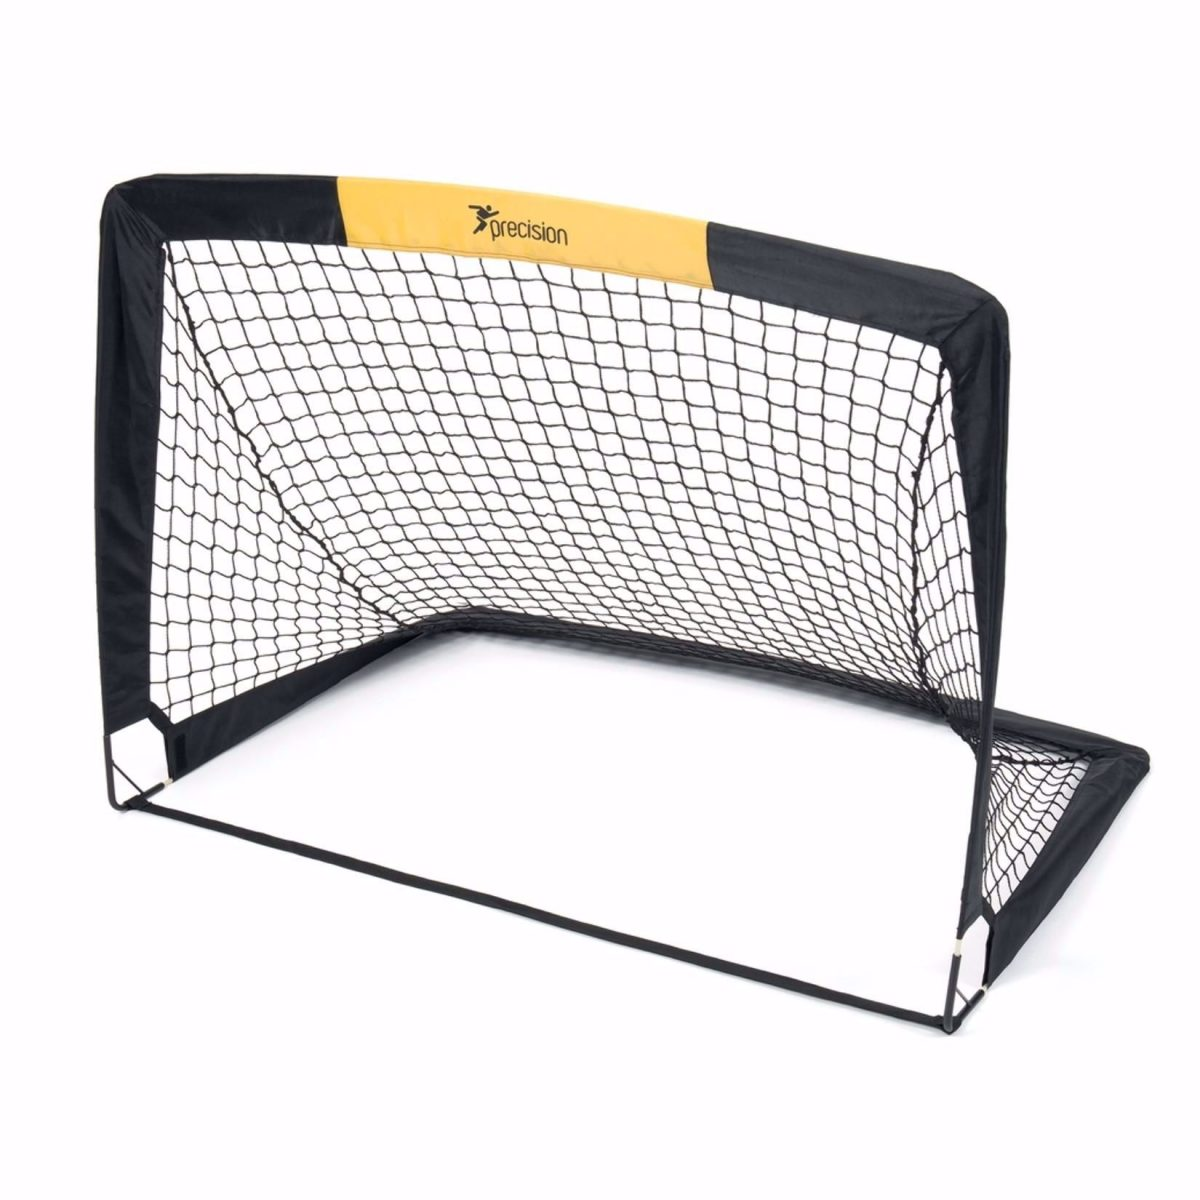 Precision Fold-A-Goal 3' x 2.25'